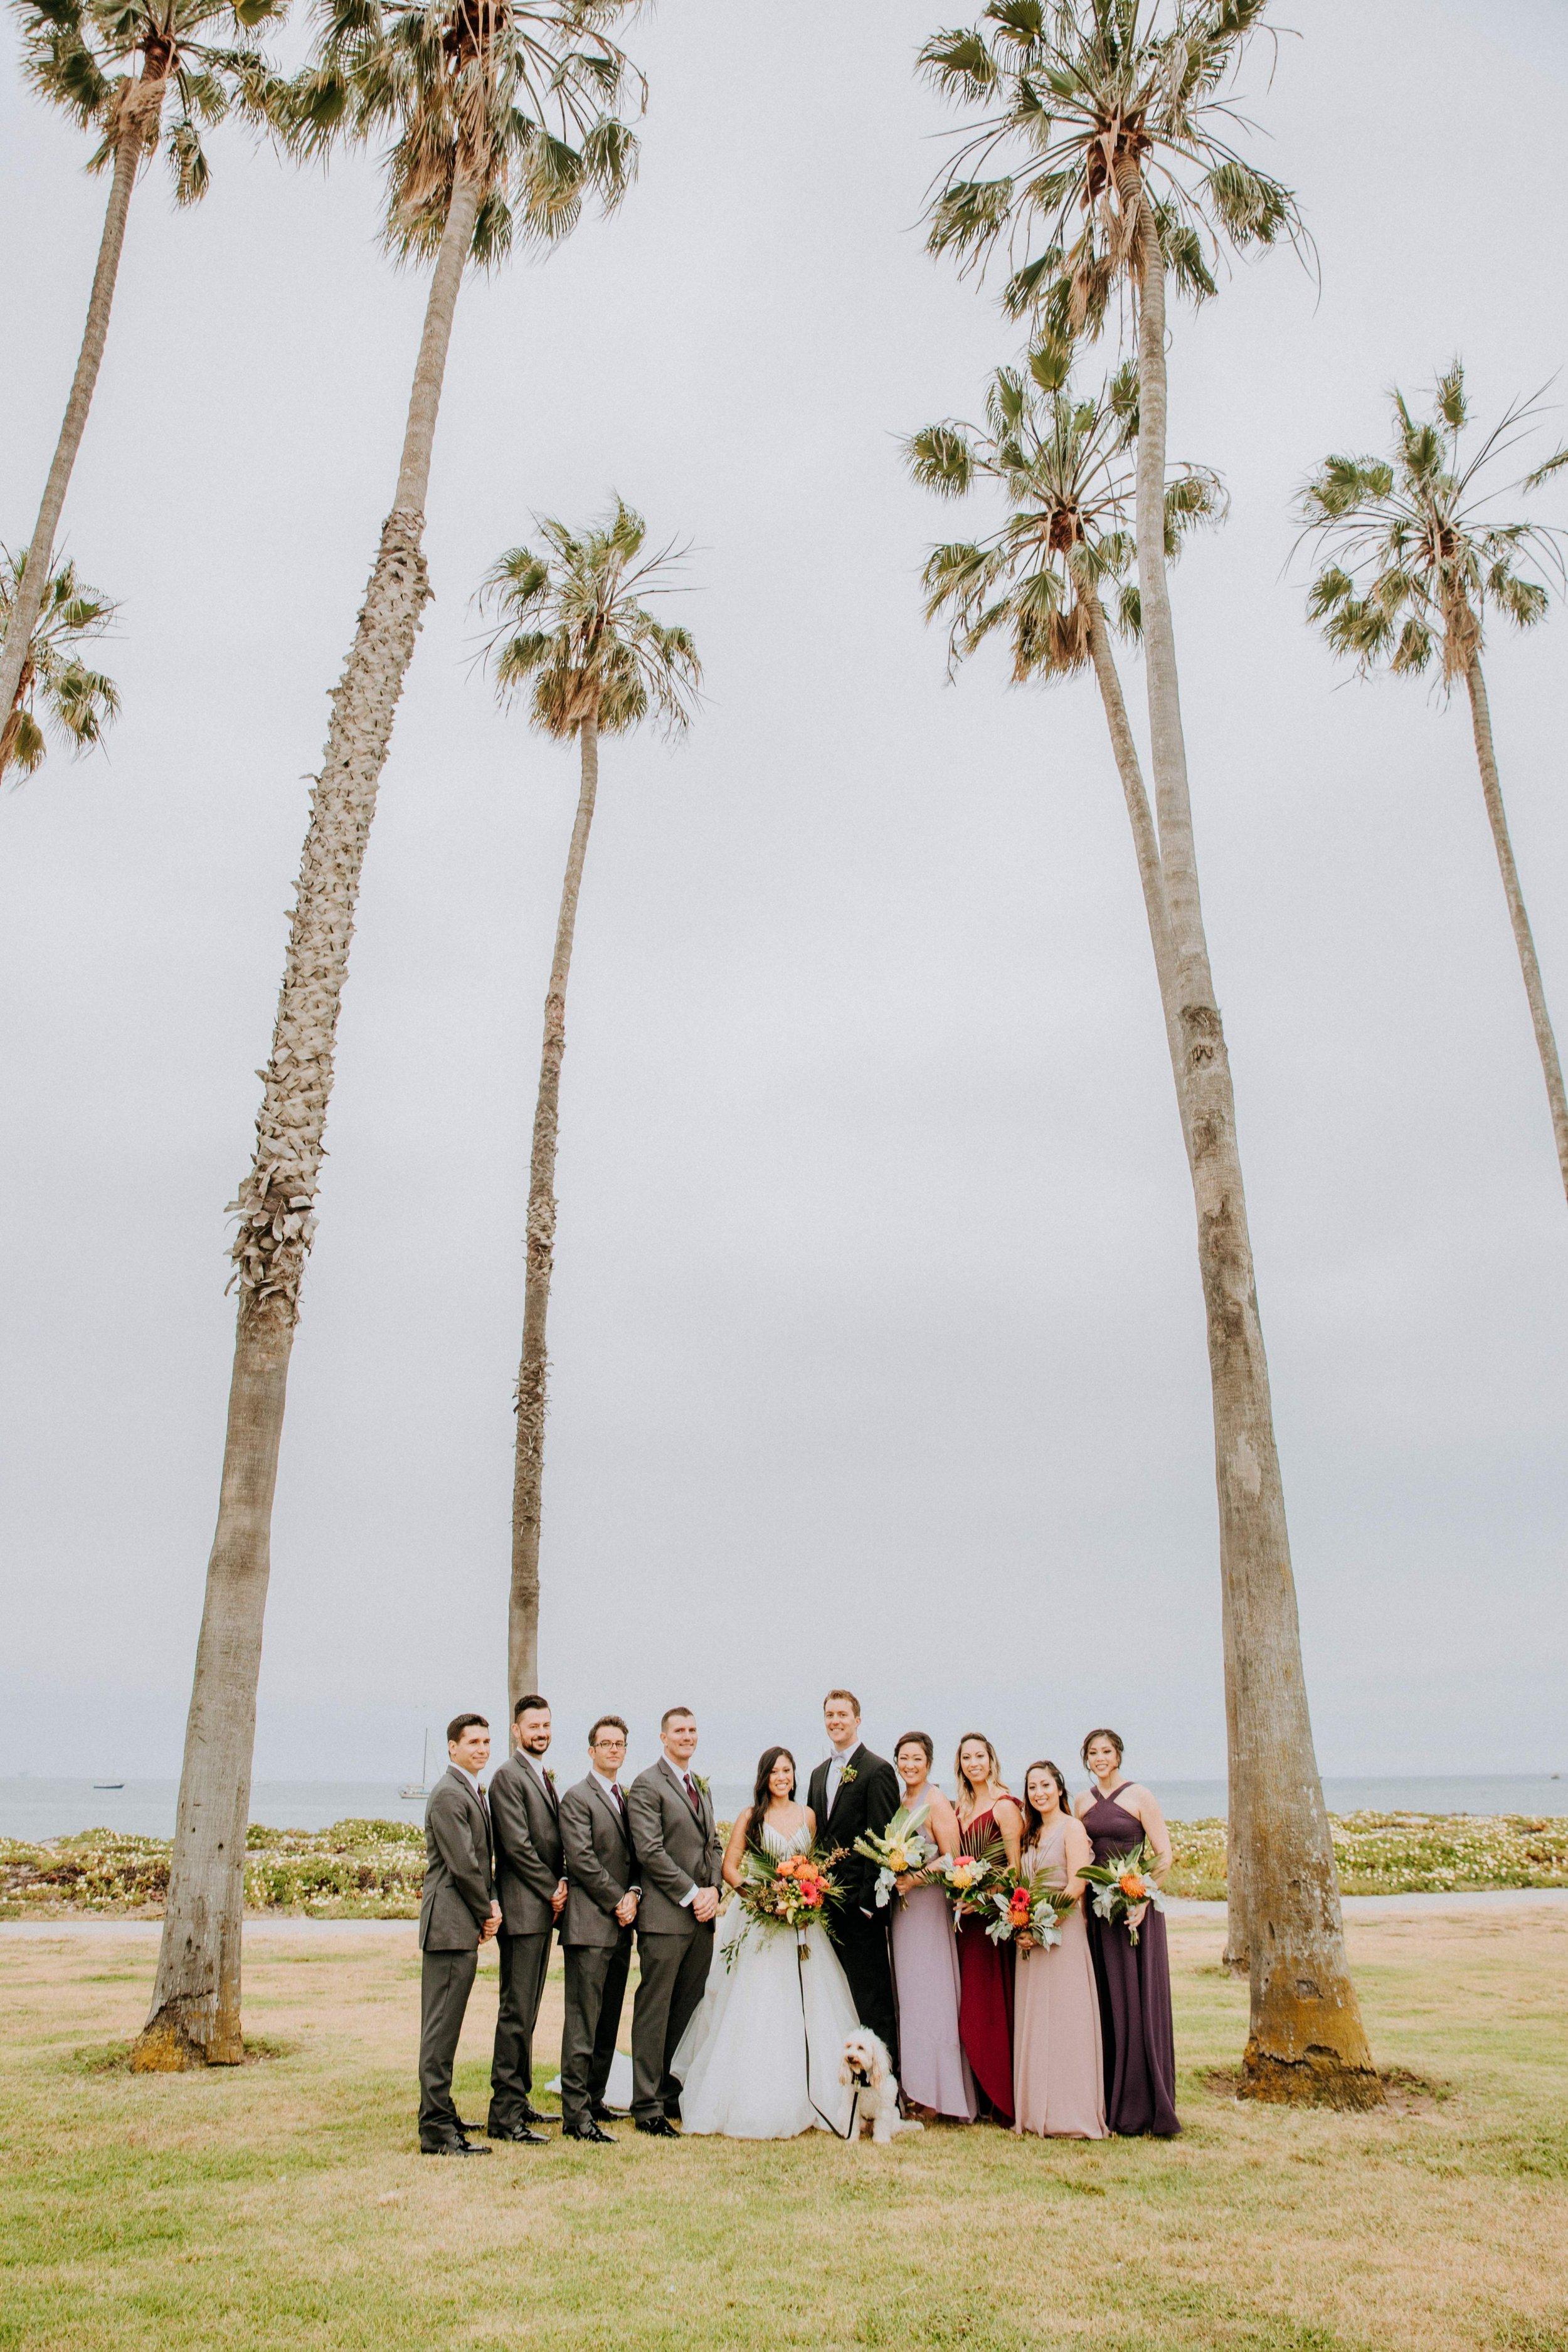 www.santabarbarawedding.com | Candice Marie Photography | Hilton Santa Barbara Beachfront Resort | Dalina Klan | Once in a Lifetime Weddings | Alpha Floral | Bridal Party by the Beach